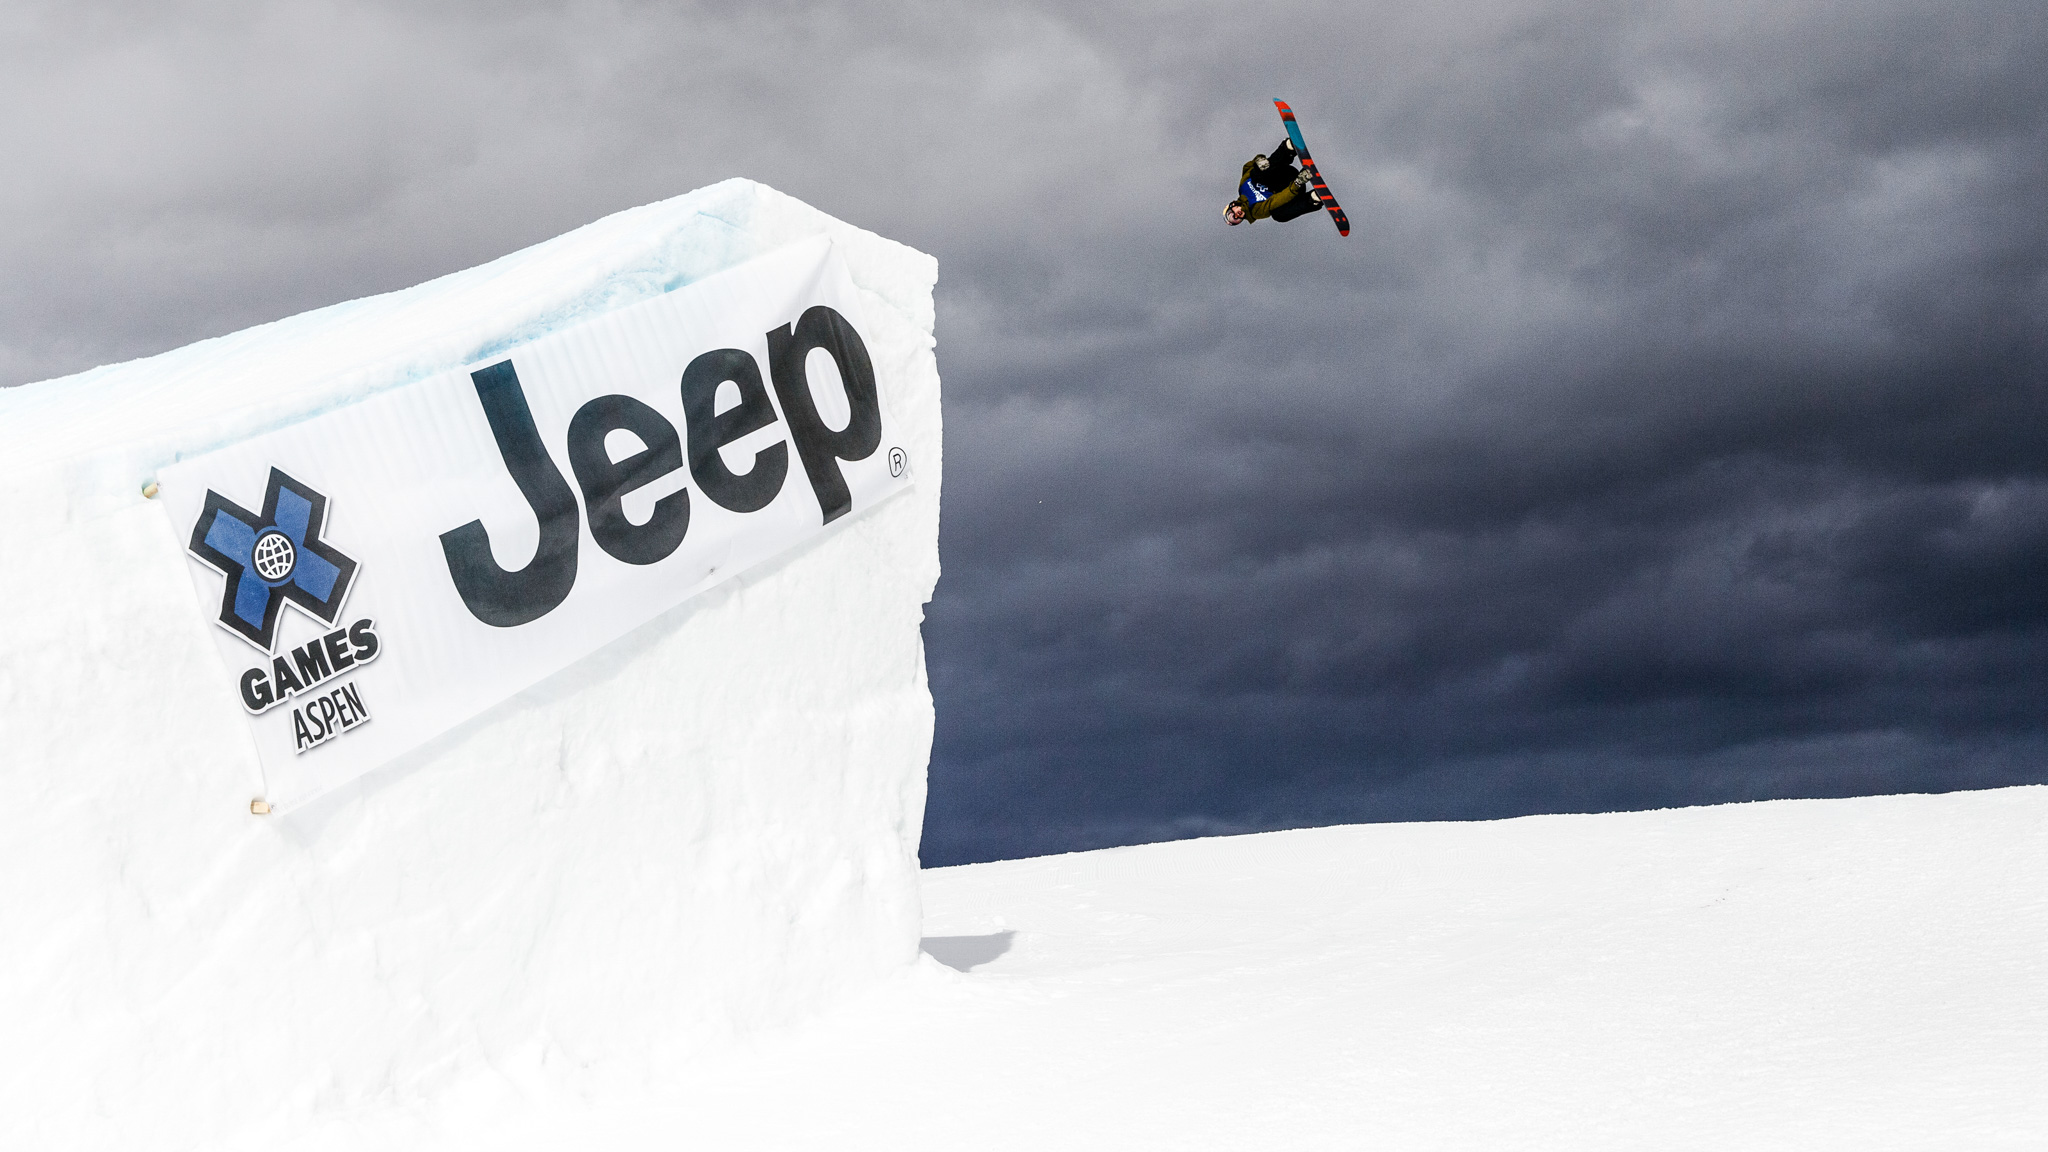 Men's Snowboard Slopestyle